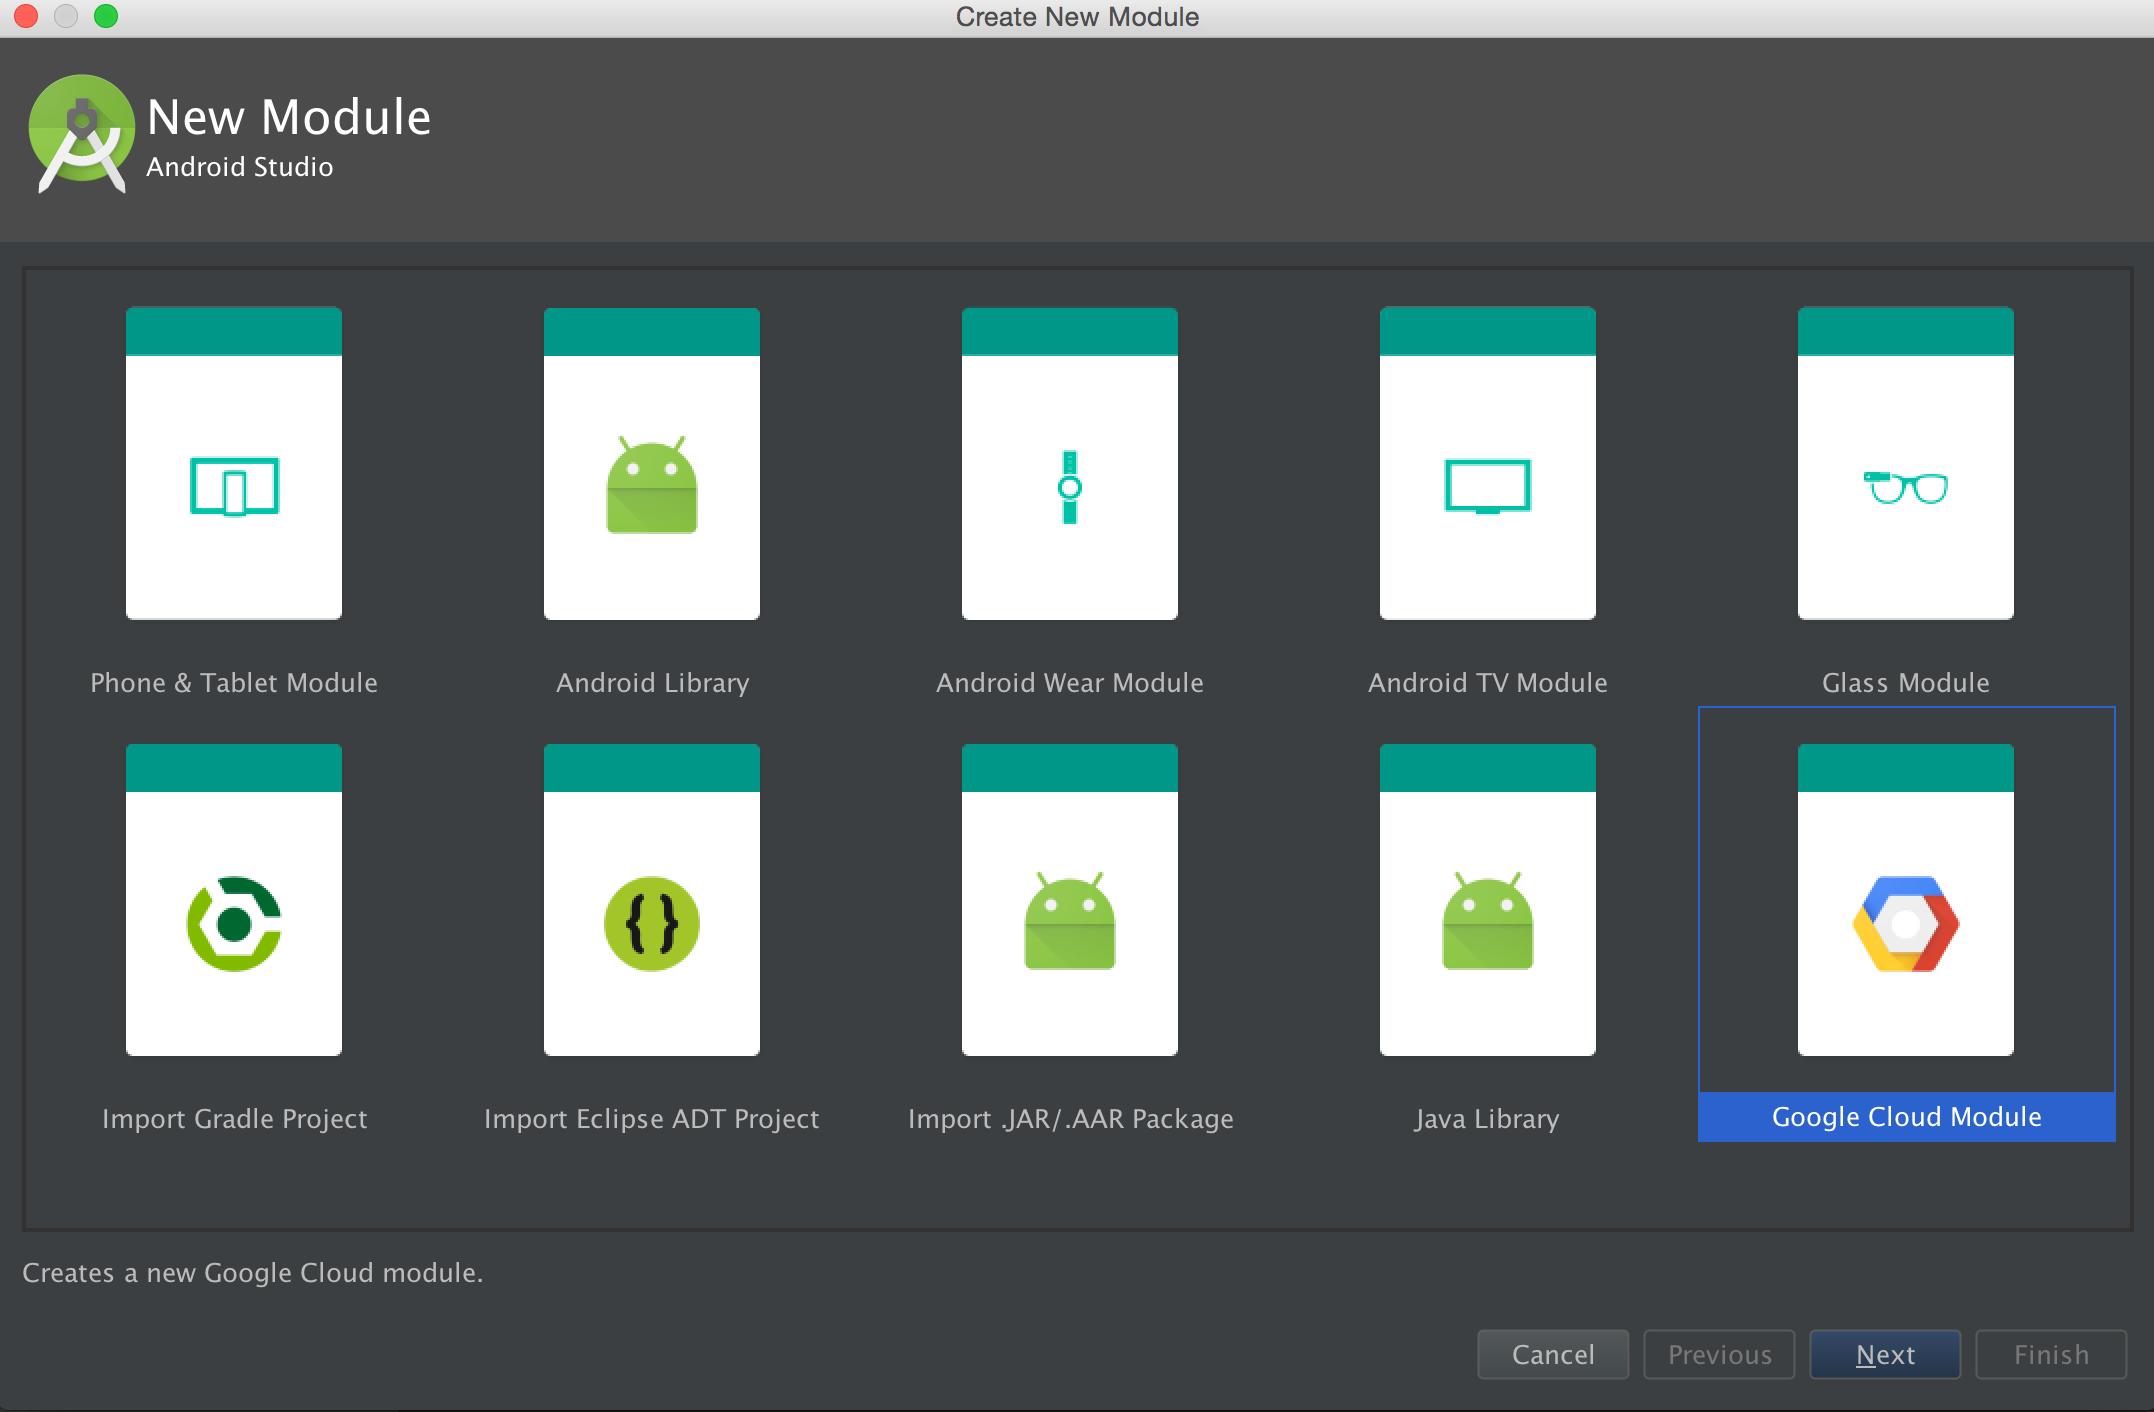 Create_New_Module_と_GAEJSample_-____AndroidStudioProjects_GAEJSample_.png